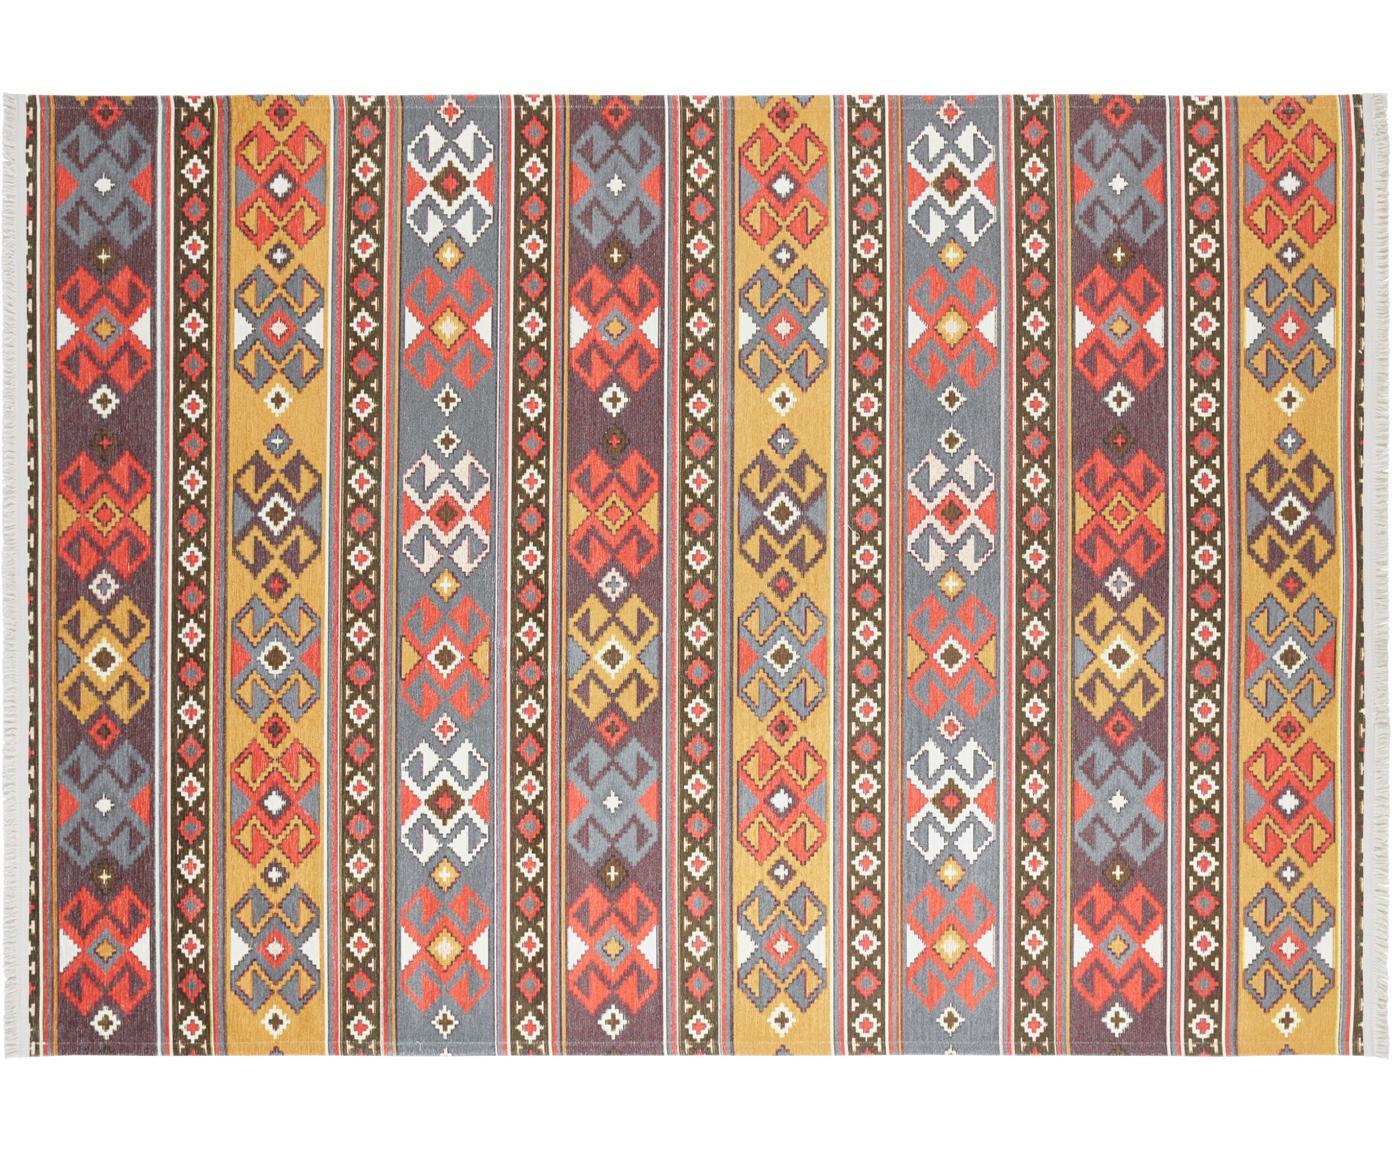 Vloerkleed Kevan, 50% polyester, 50% katoen, Multicolour, 160 x 230 cm